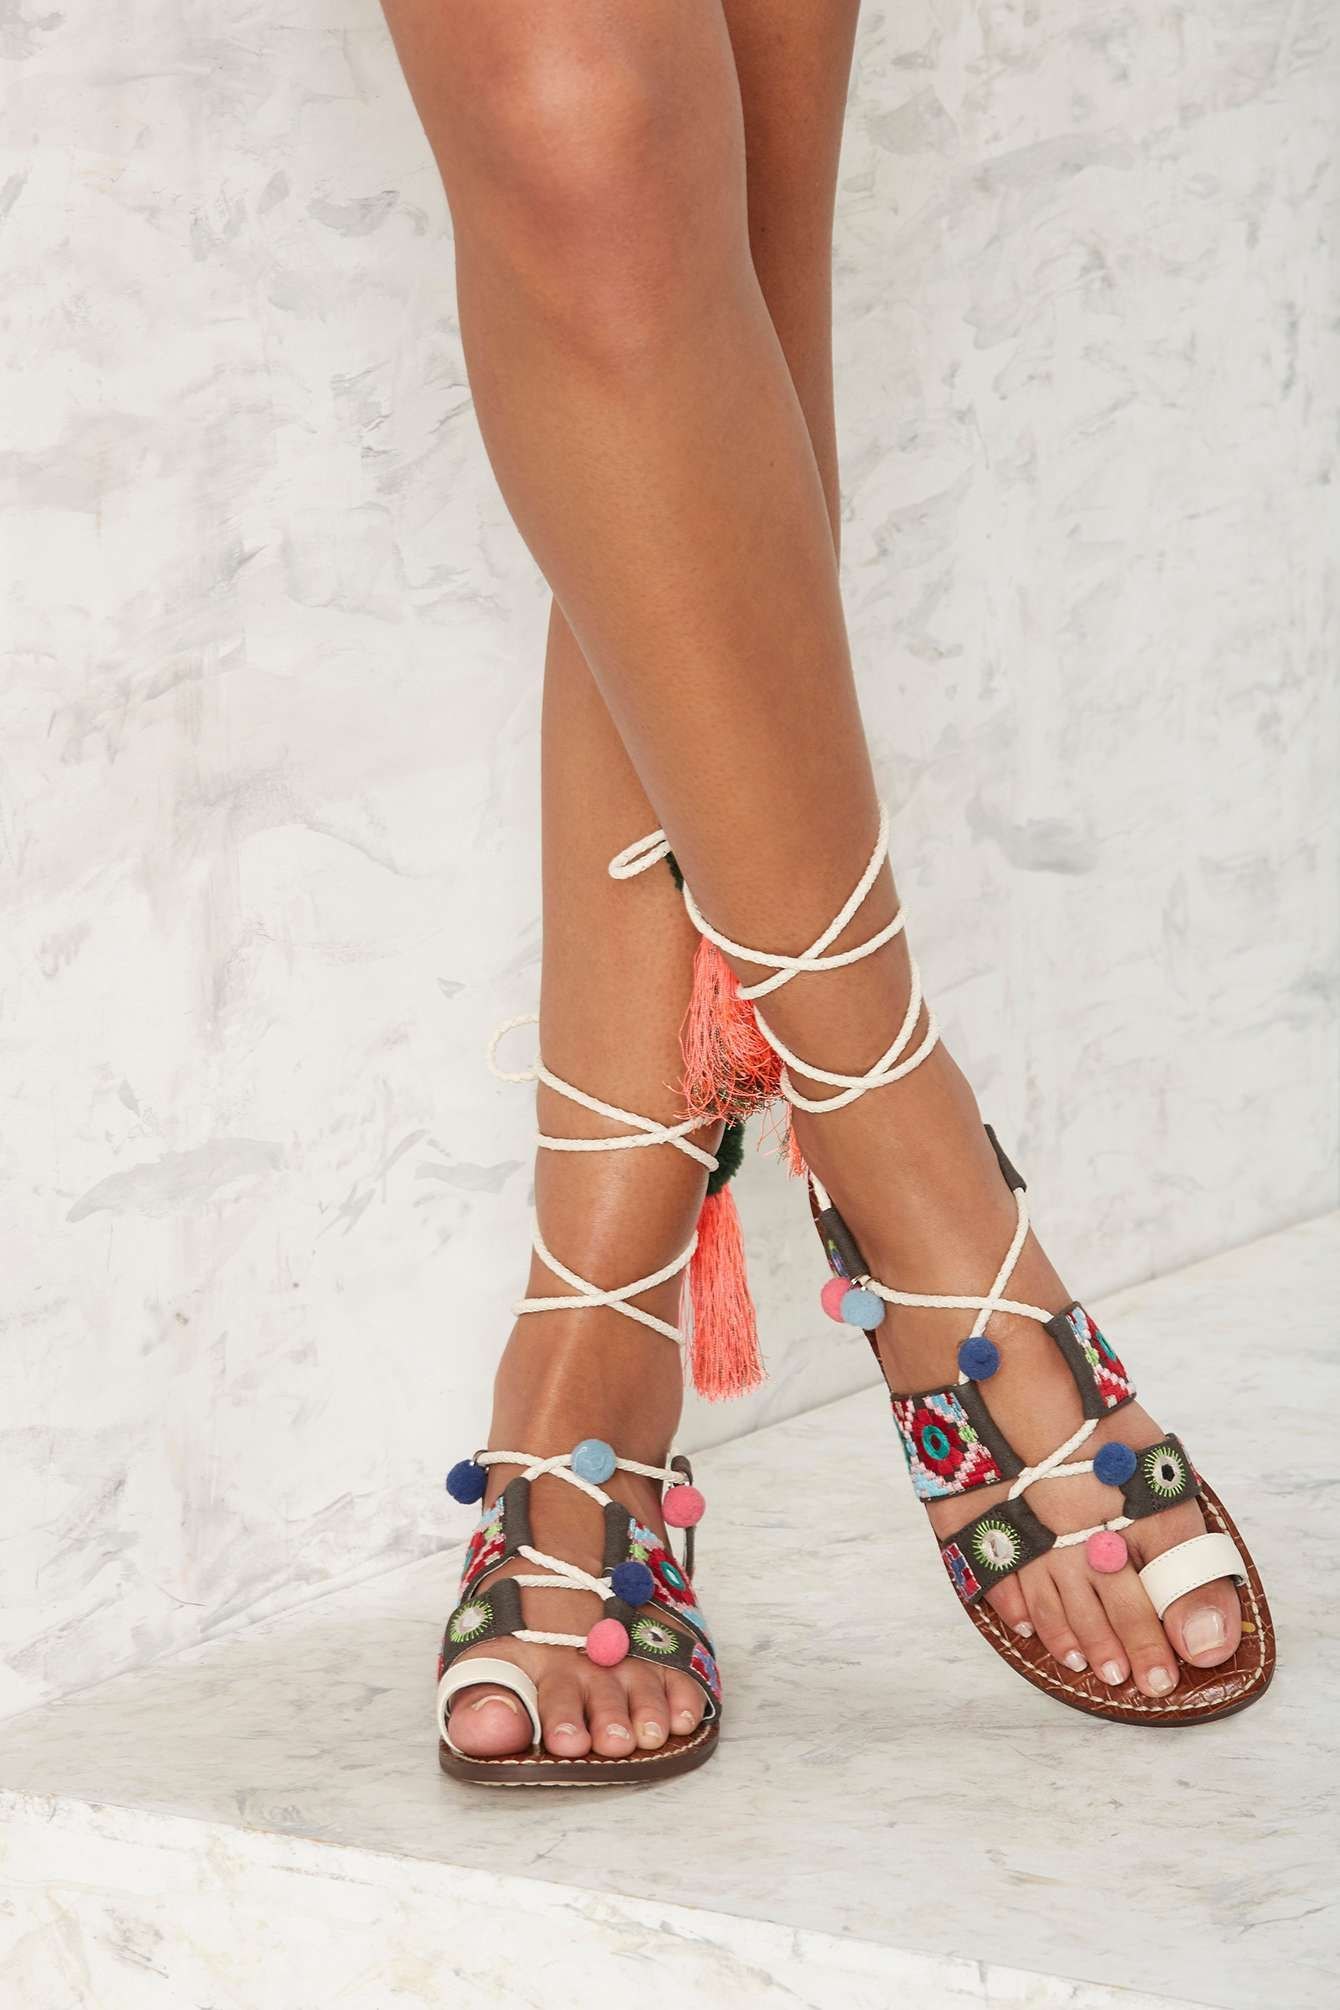 56fe2ff508f Sam Edelman Gretchen Embroidered Gladiator Sandal